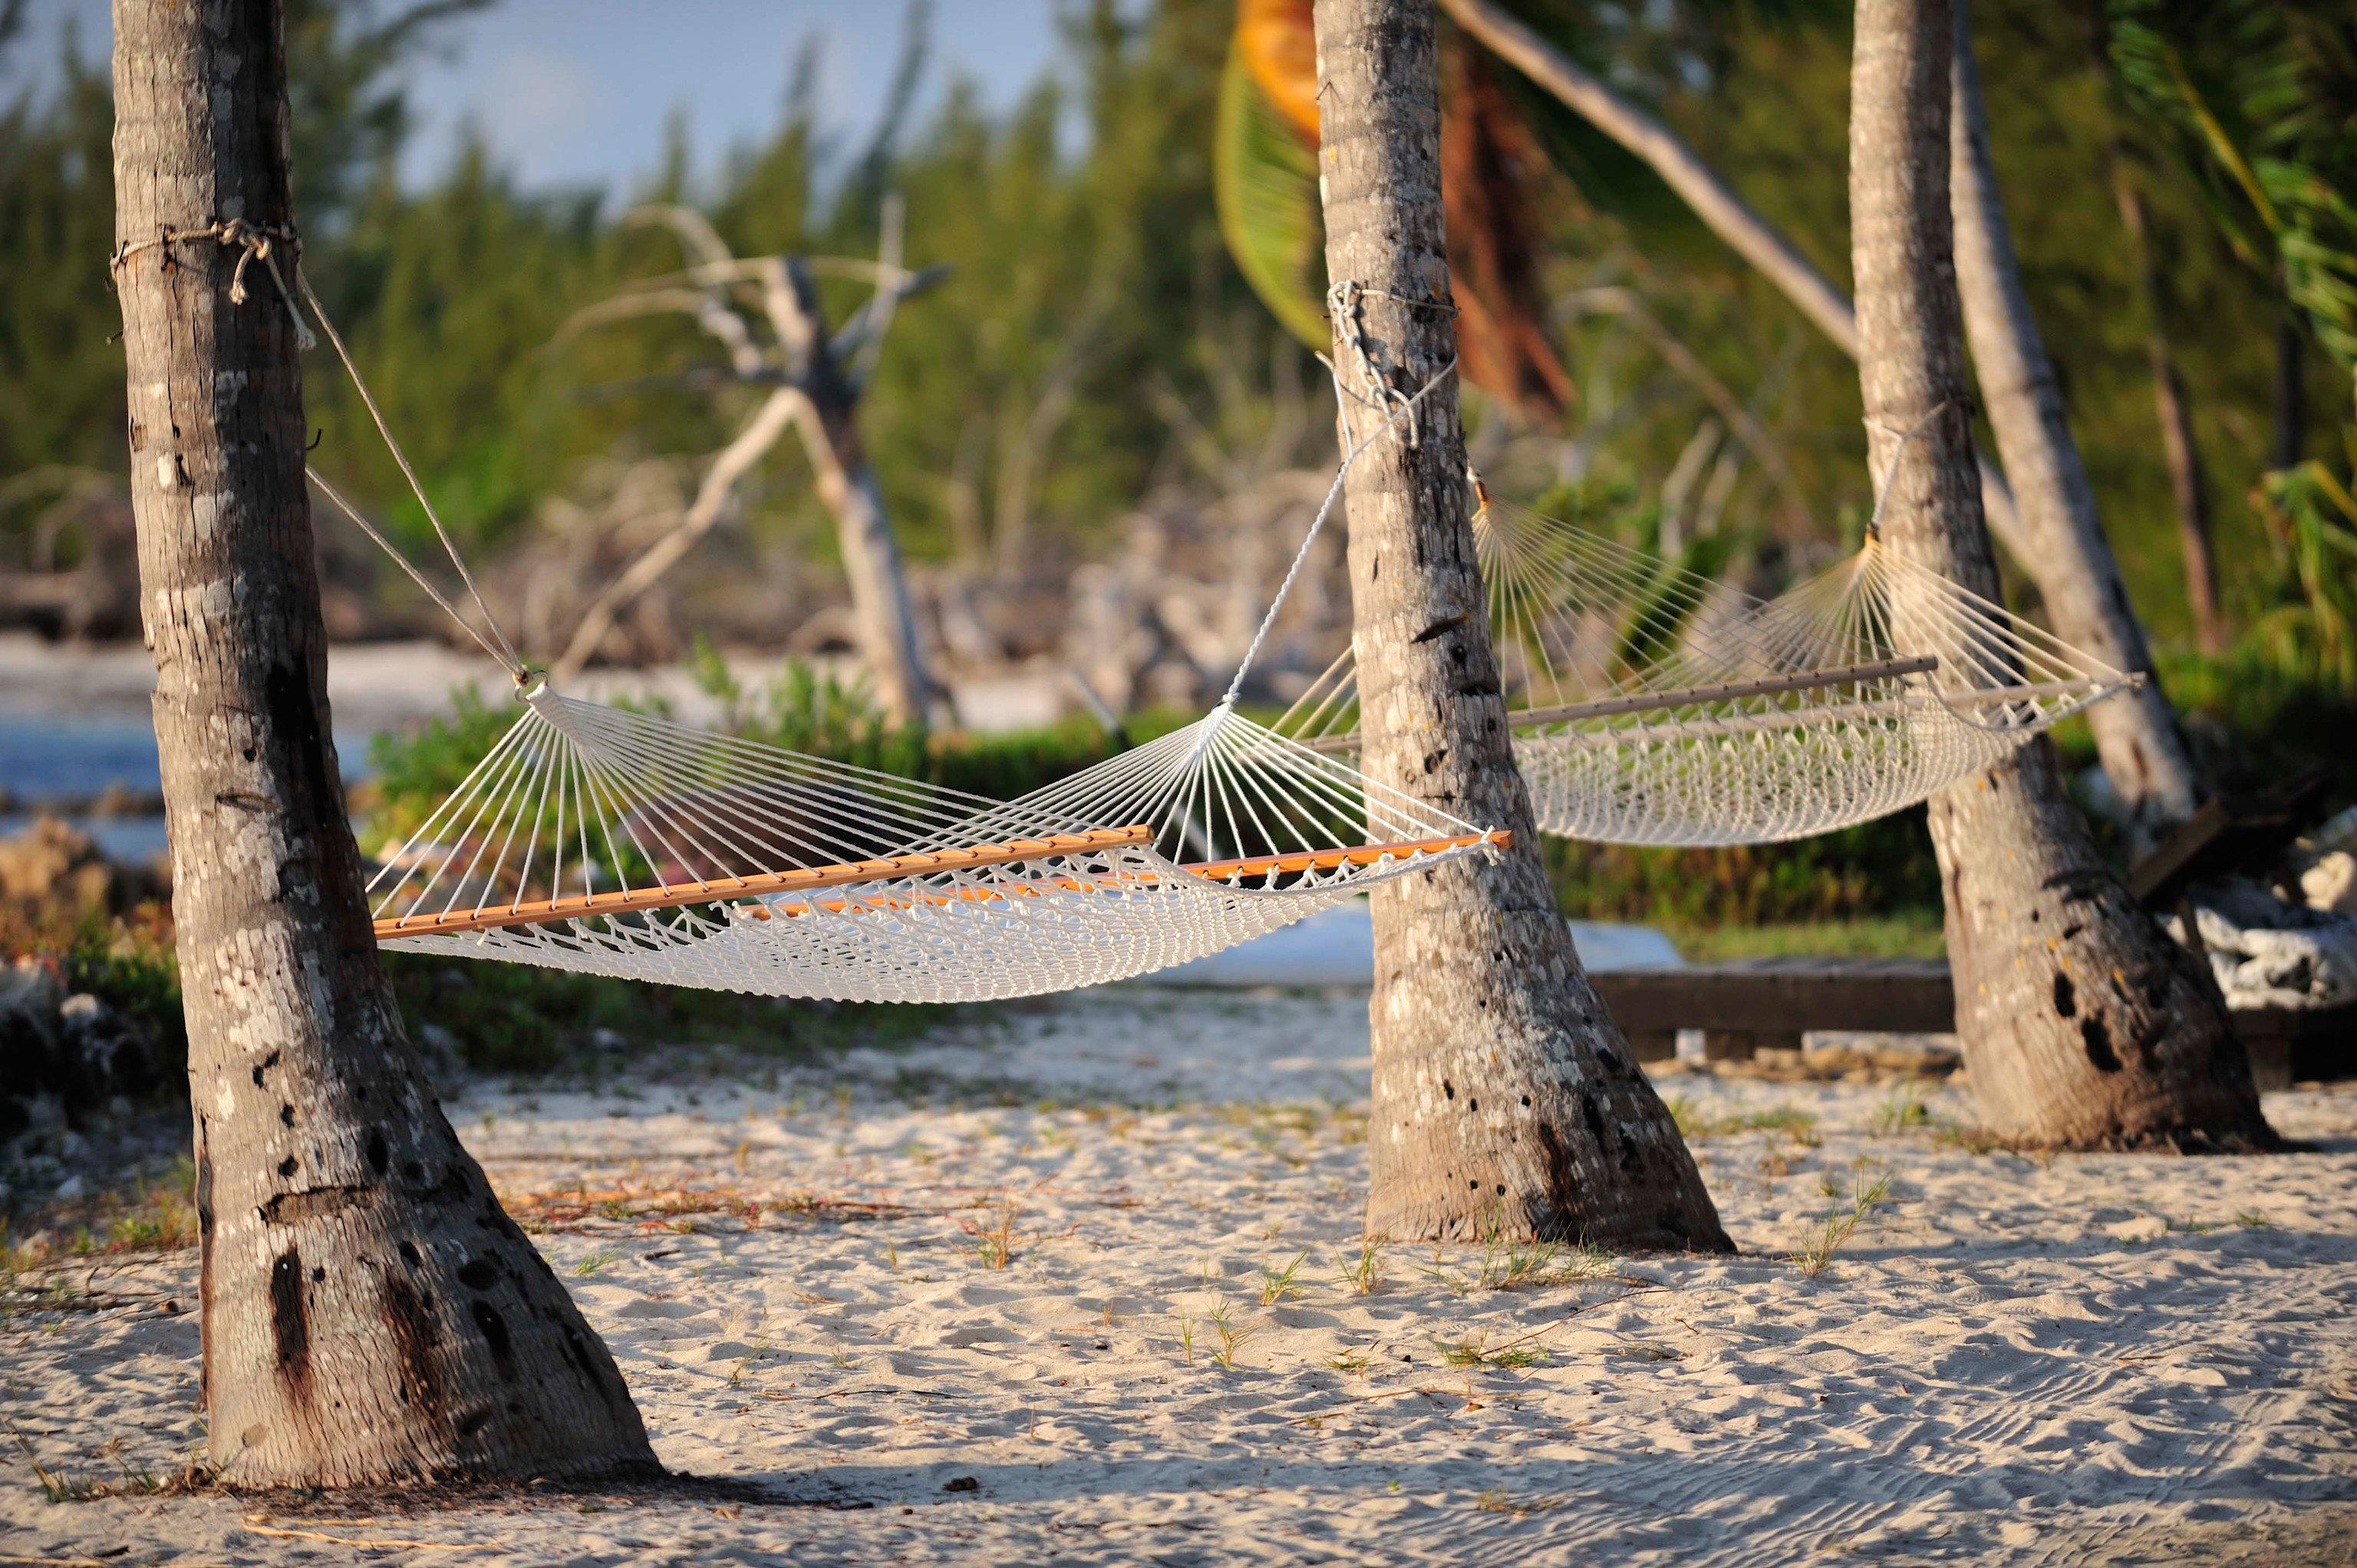 Hotels tree outdoor ground Nature Wildlife hammock bed branch wood Bird plant prop root root